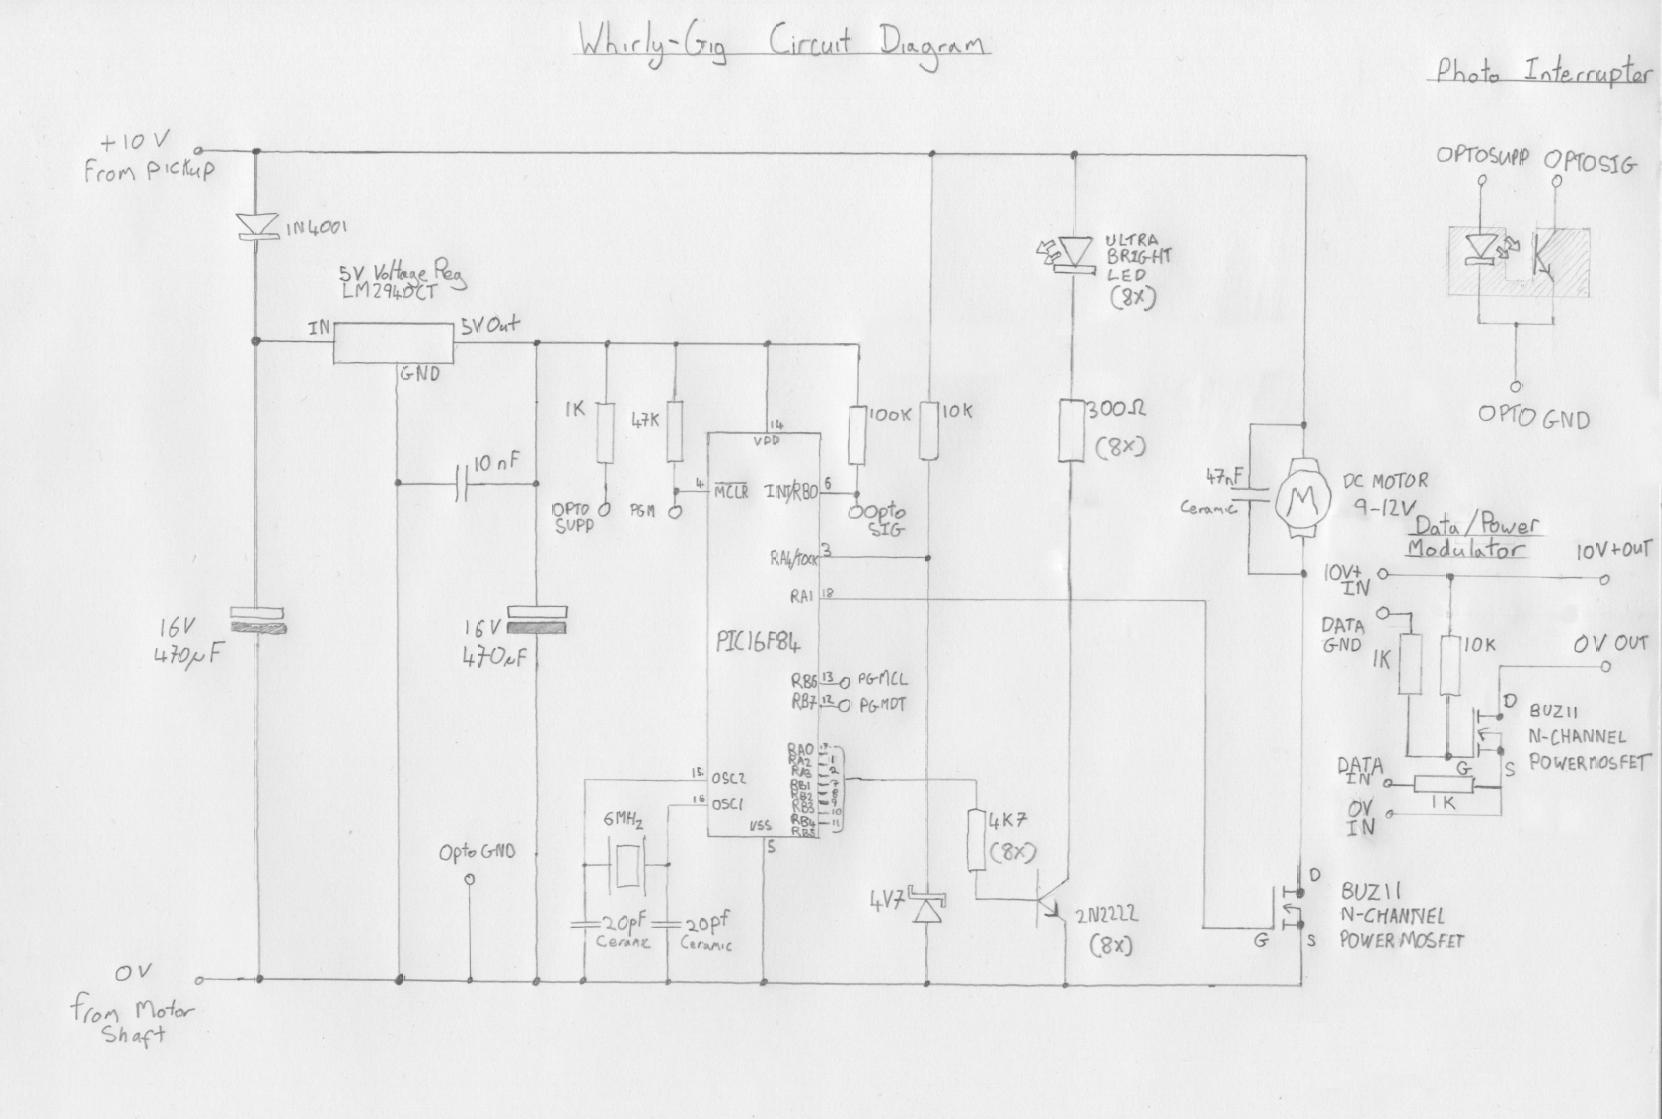 Cde Rotator Control Wiring Diagram Schematic Daiwa Free Download Basic Hvac Ladder Diagrams Elsalvadorla